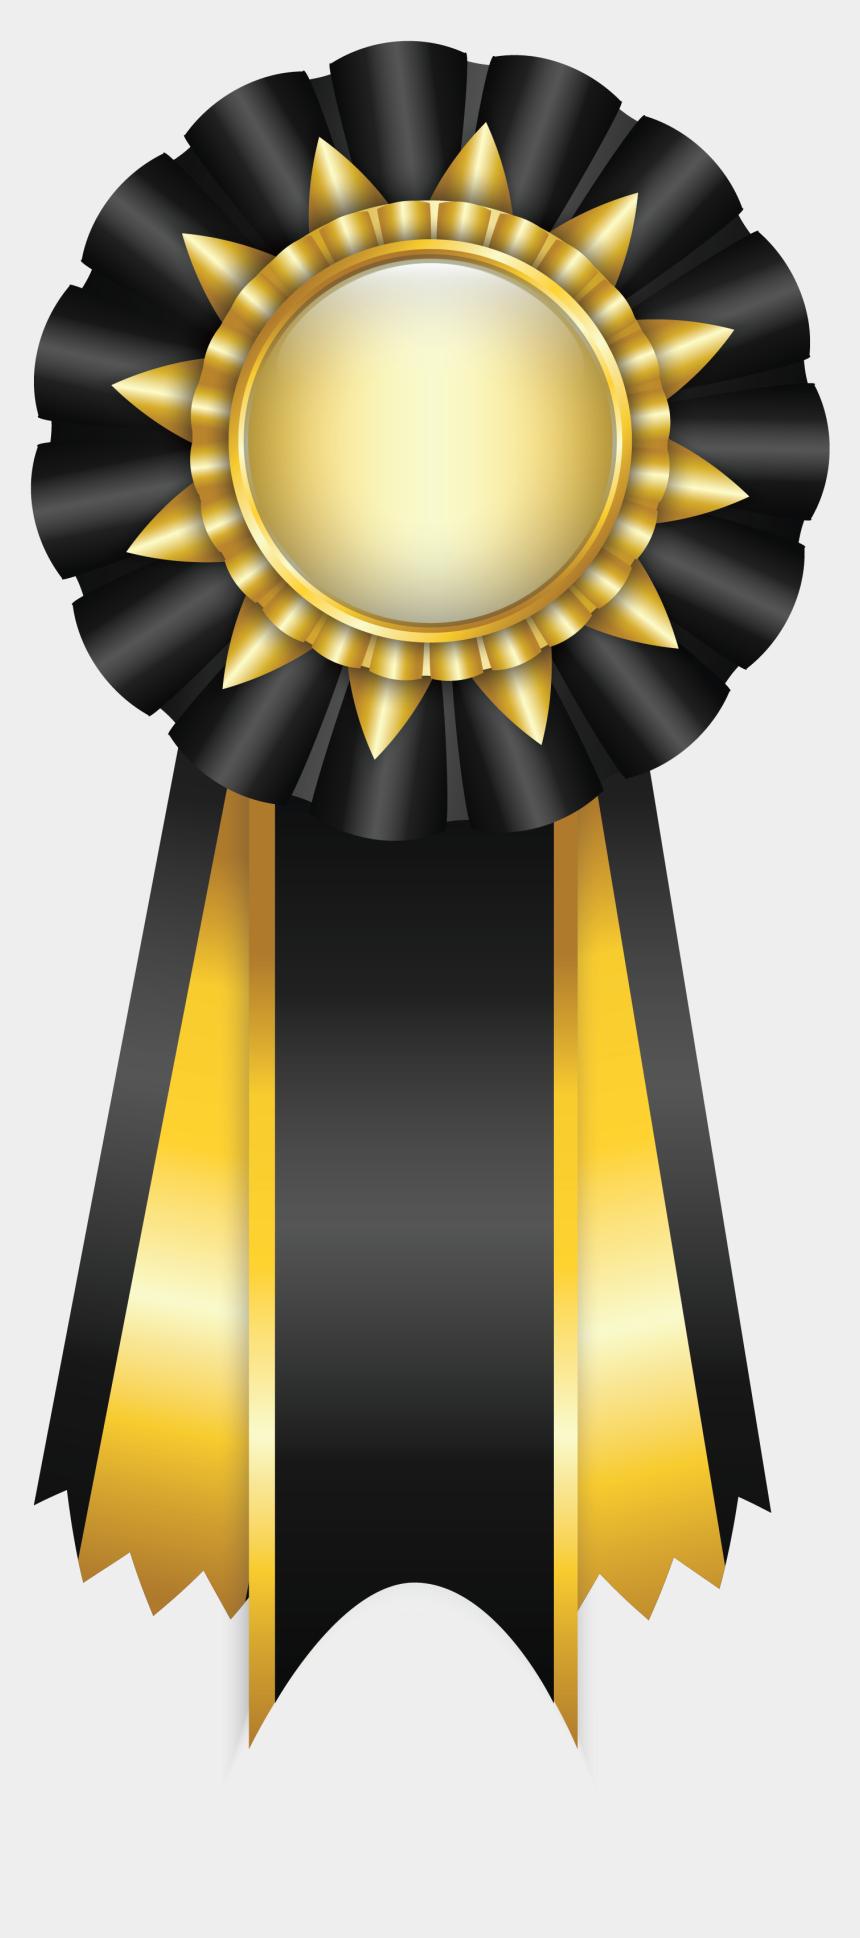 winner clipart, Cartoons - Black Rosette Ribbon Png Picture Backgrounds Ⓒ - Ribbon Design For Graduation